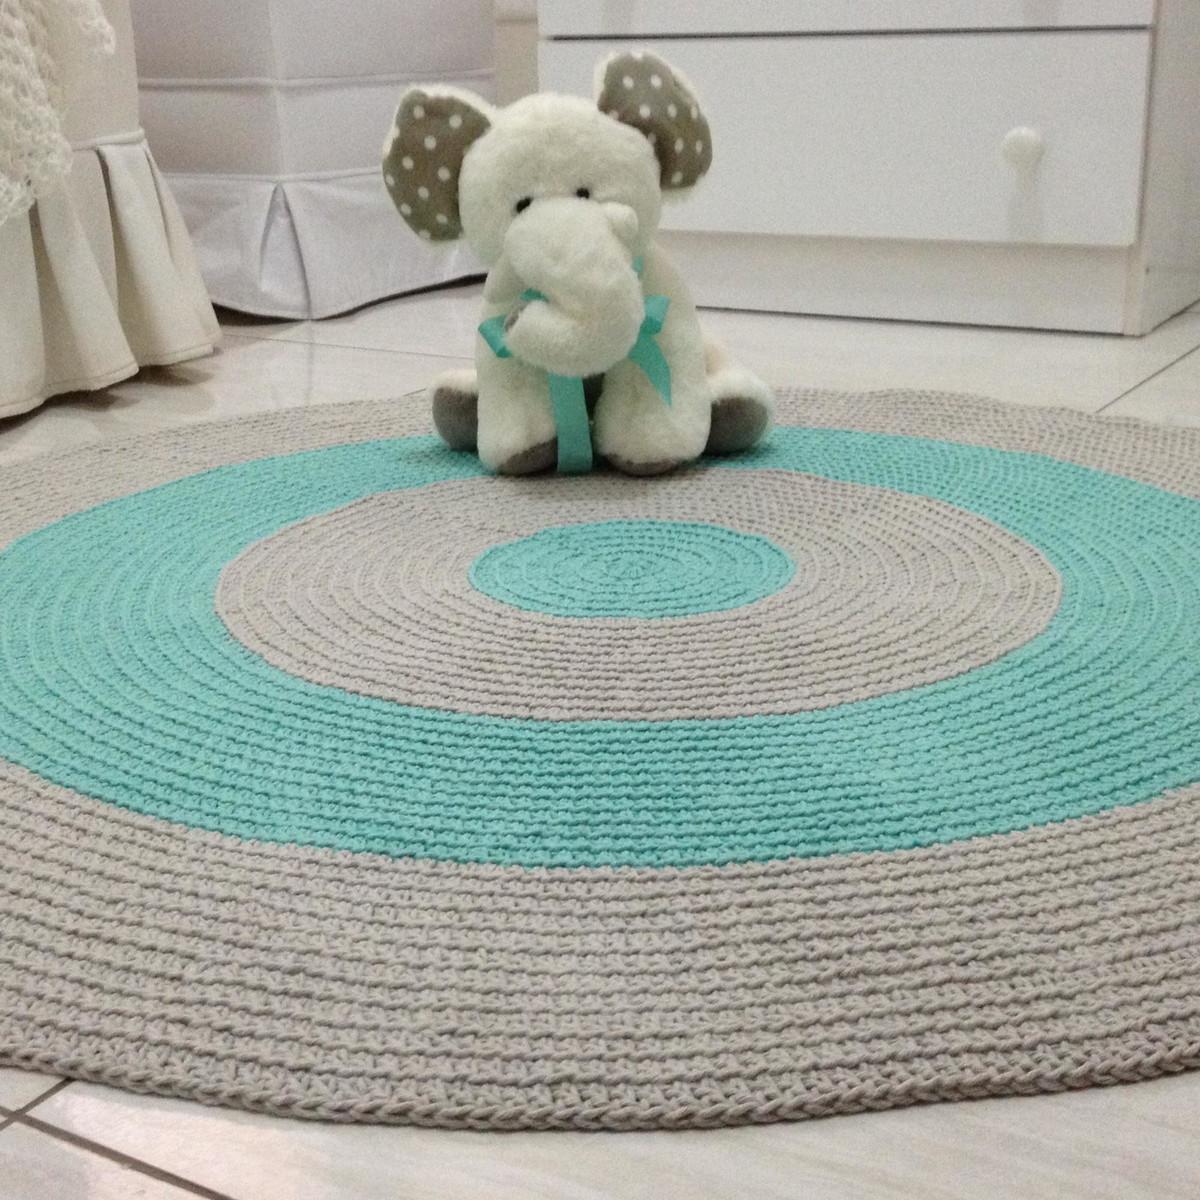 tapete croch redondo verde agua e cinza baby luquinha ateli vera peixoto elo7. Black Bedroom Furniture Sets. Home Design Ideas